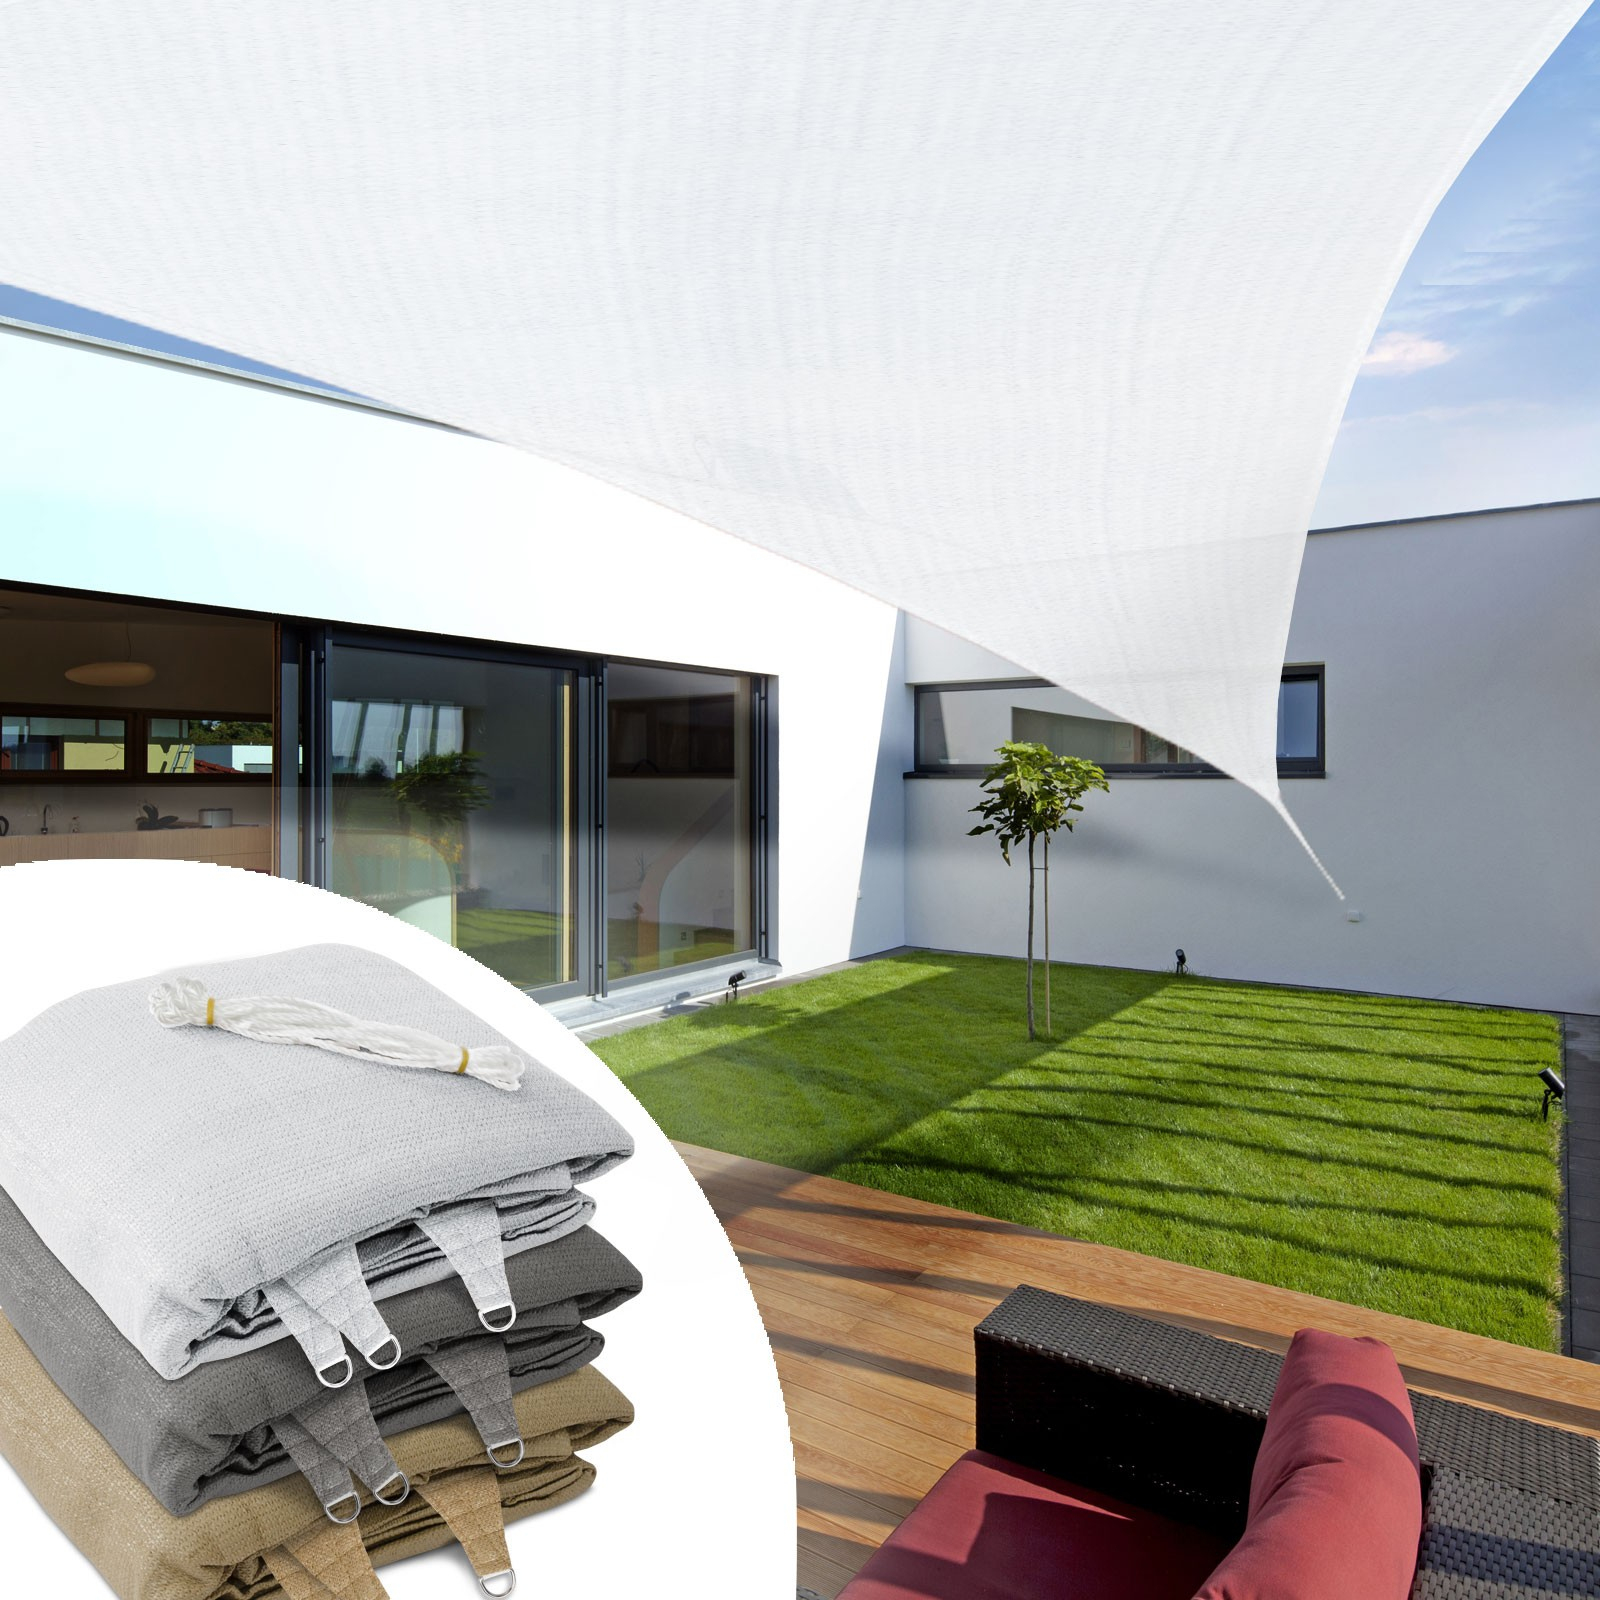 Toiles Tendues Pour Jardin, Balcon, Terrasse - Protection Anti Uv pour Toile Tendu Jardin